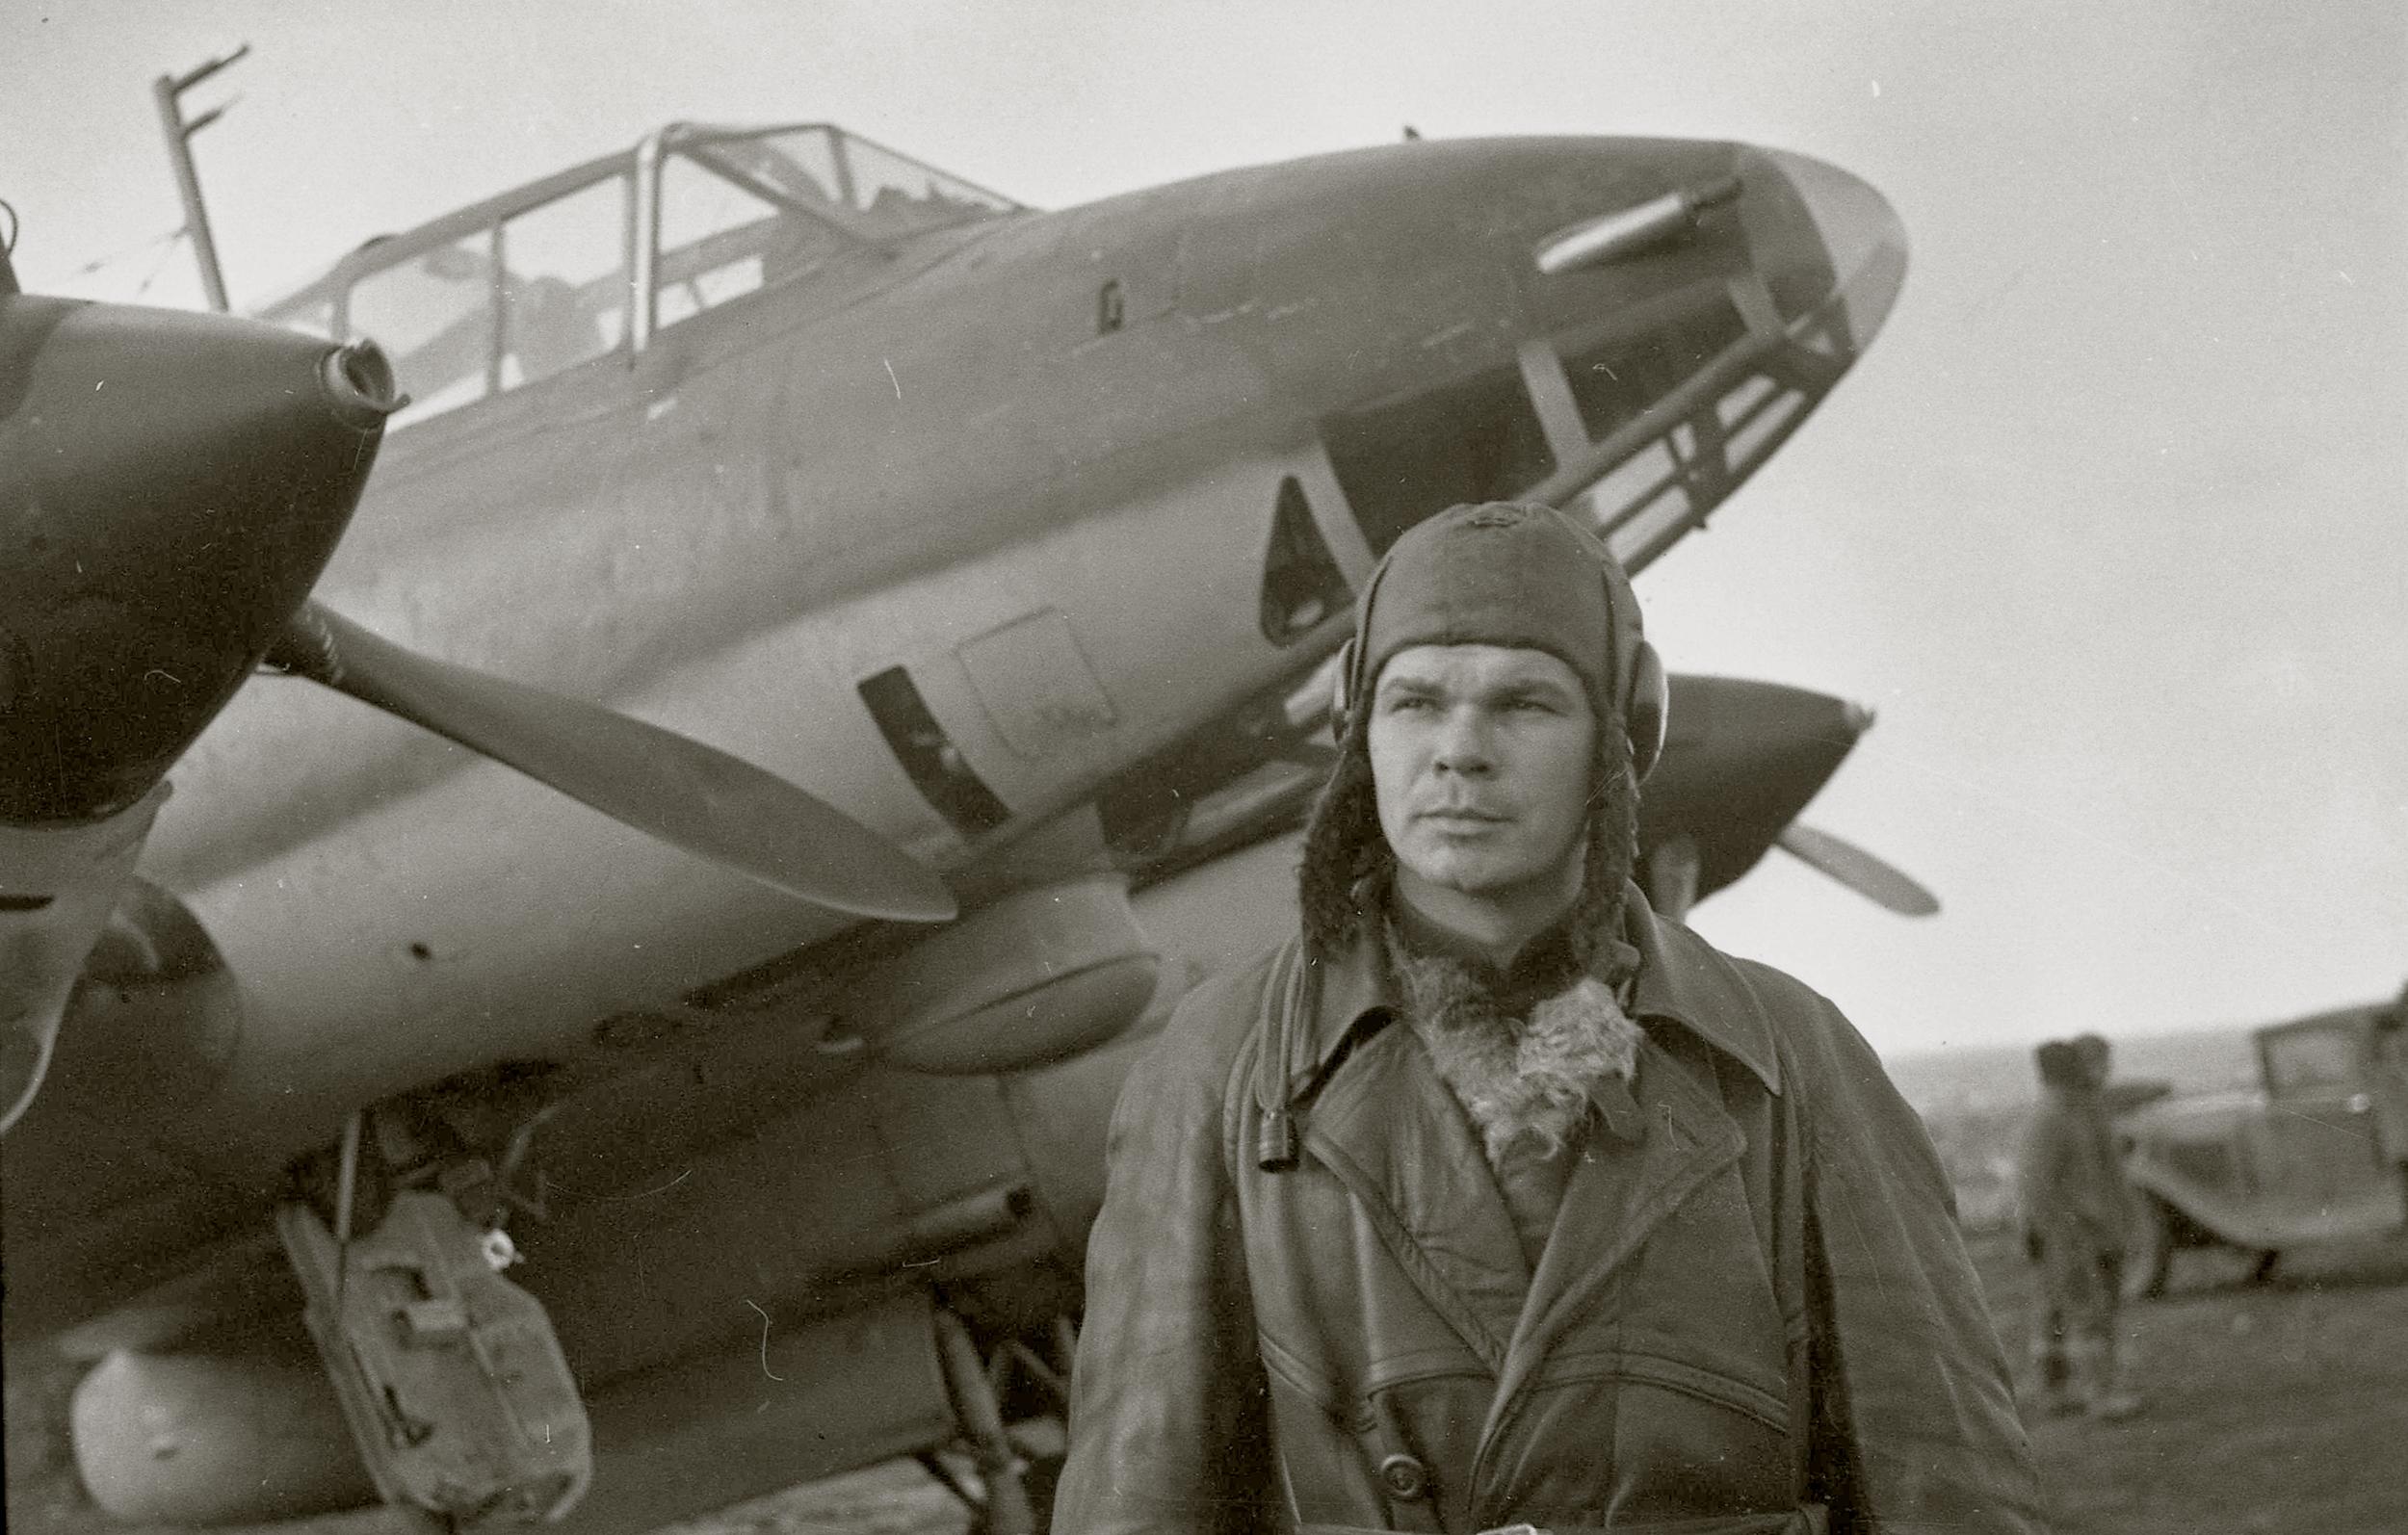 Aircrew Soviet 40GvBAP Hero of the Soviet Union Lt Colonel Korzunov 1942 01